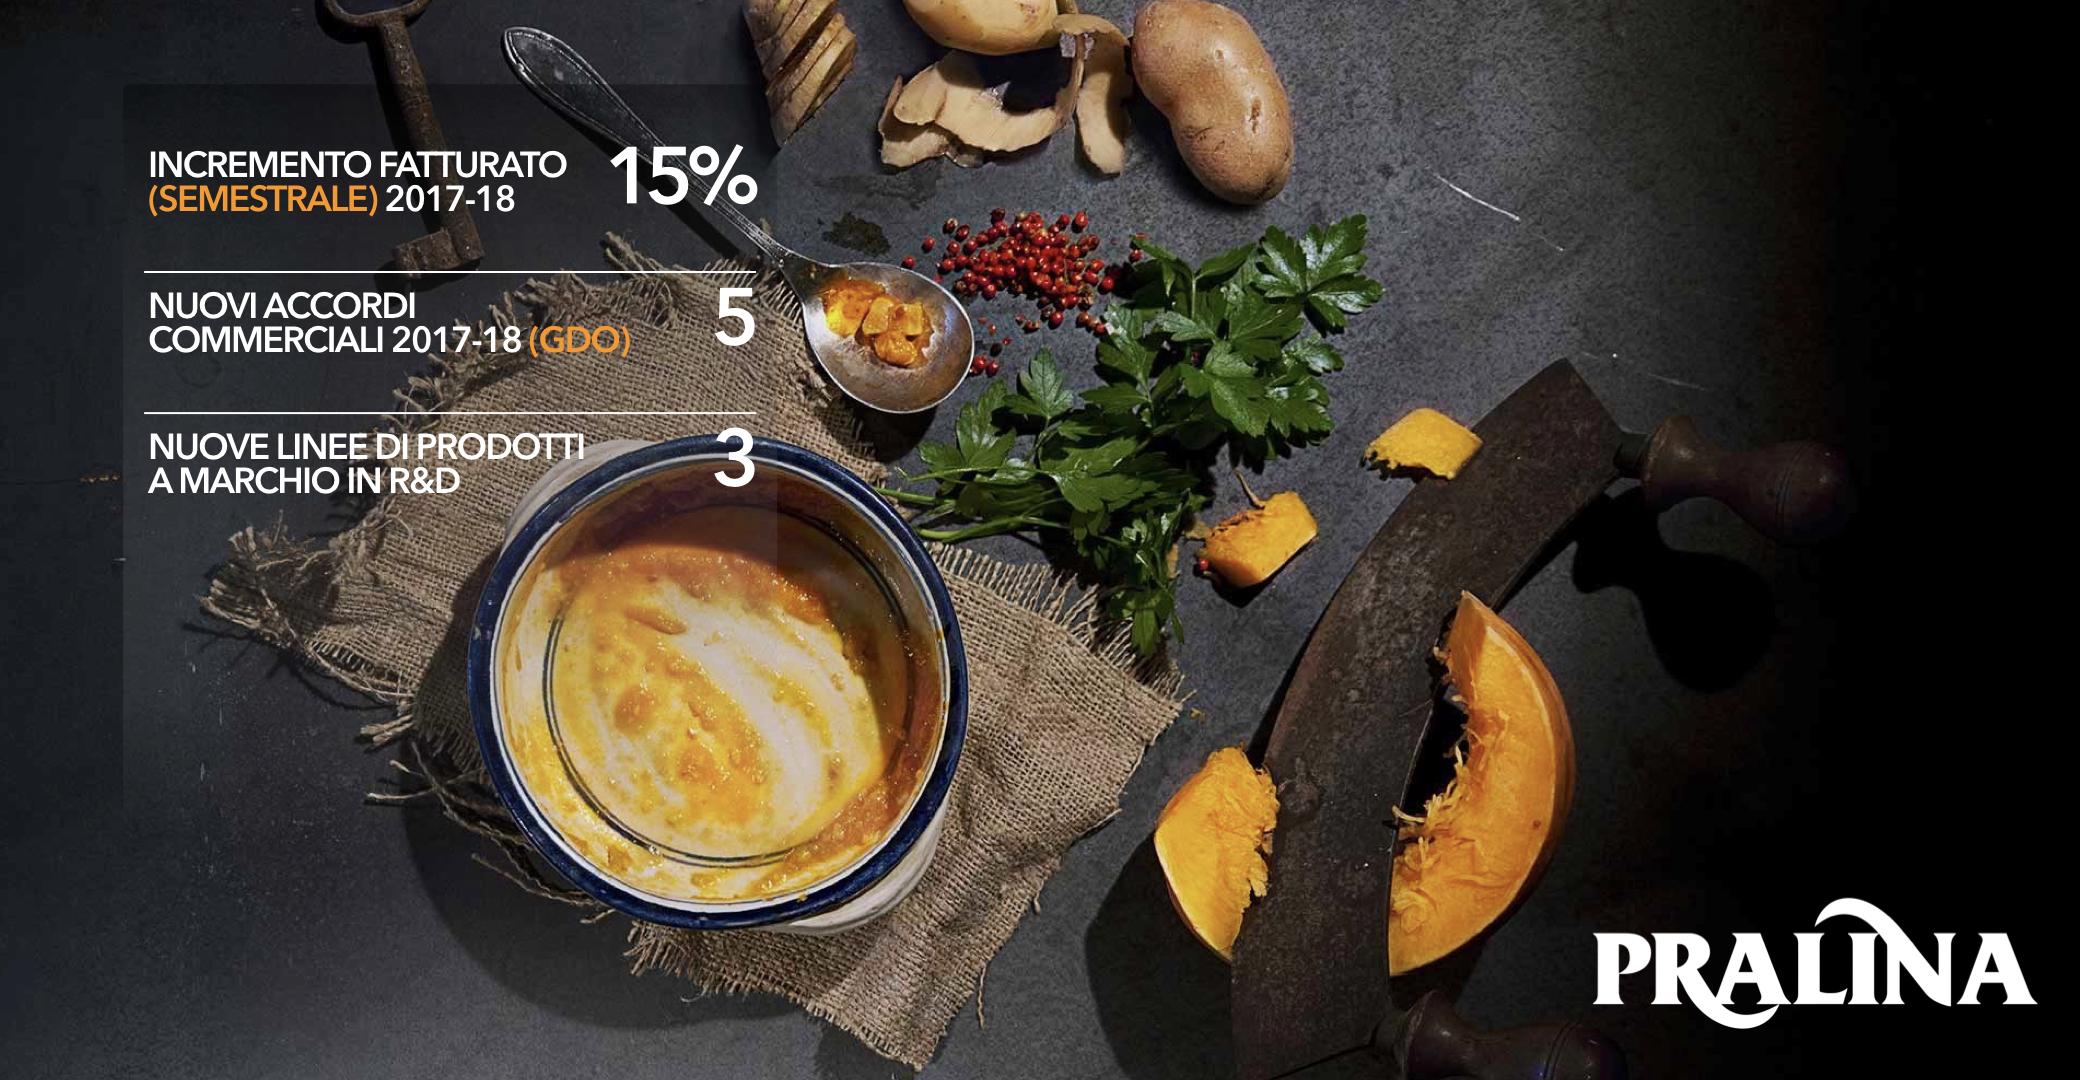 pralina-crowdfunding-zuppe